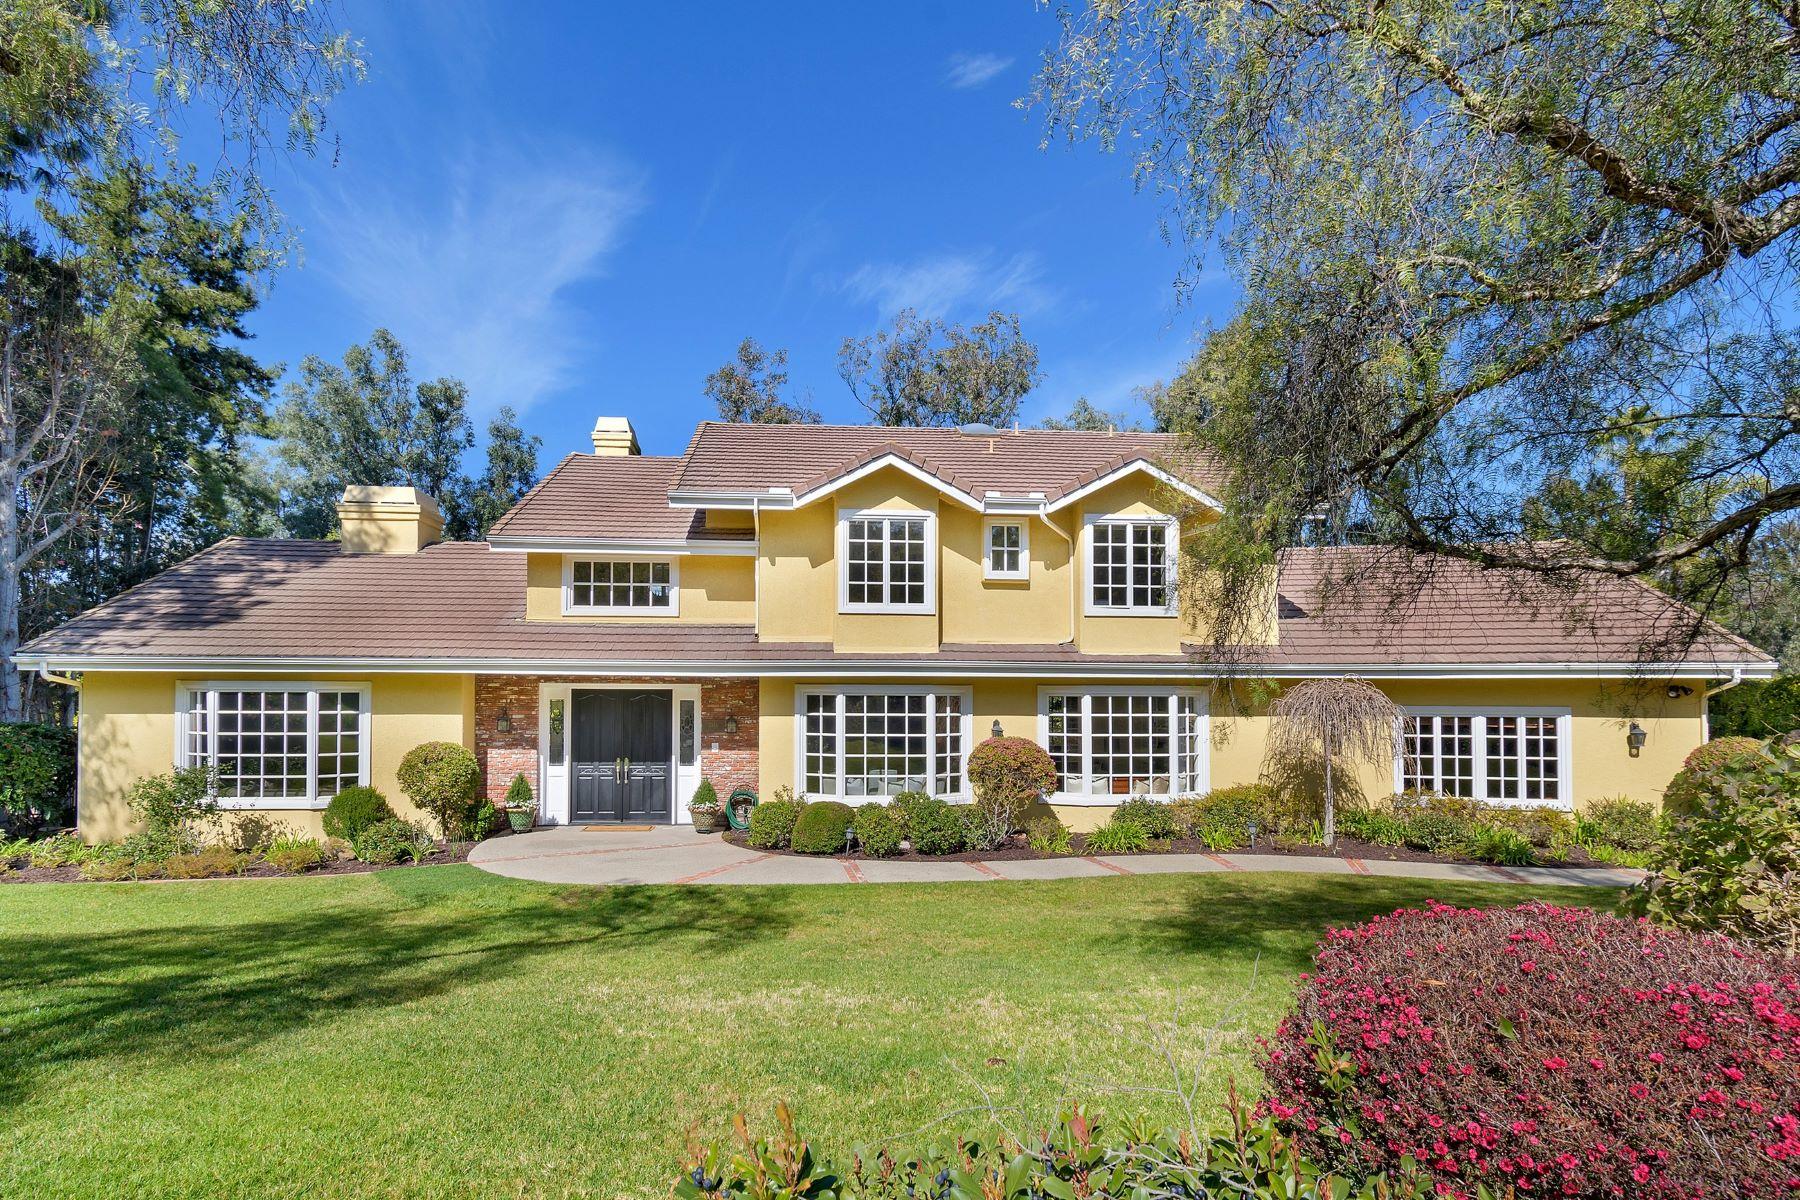 Single Family Homes for Sale at 17844 Circa Oriente Rancho Santa Fe, California 92067 United States